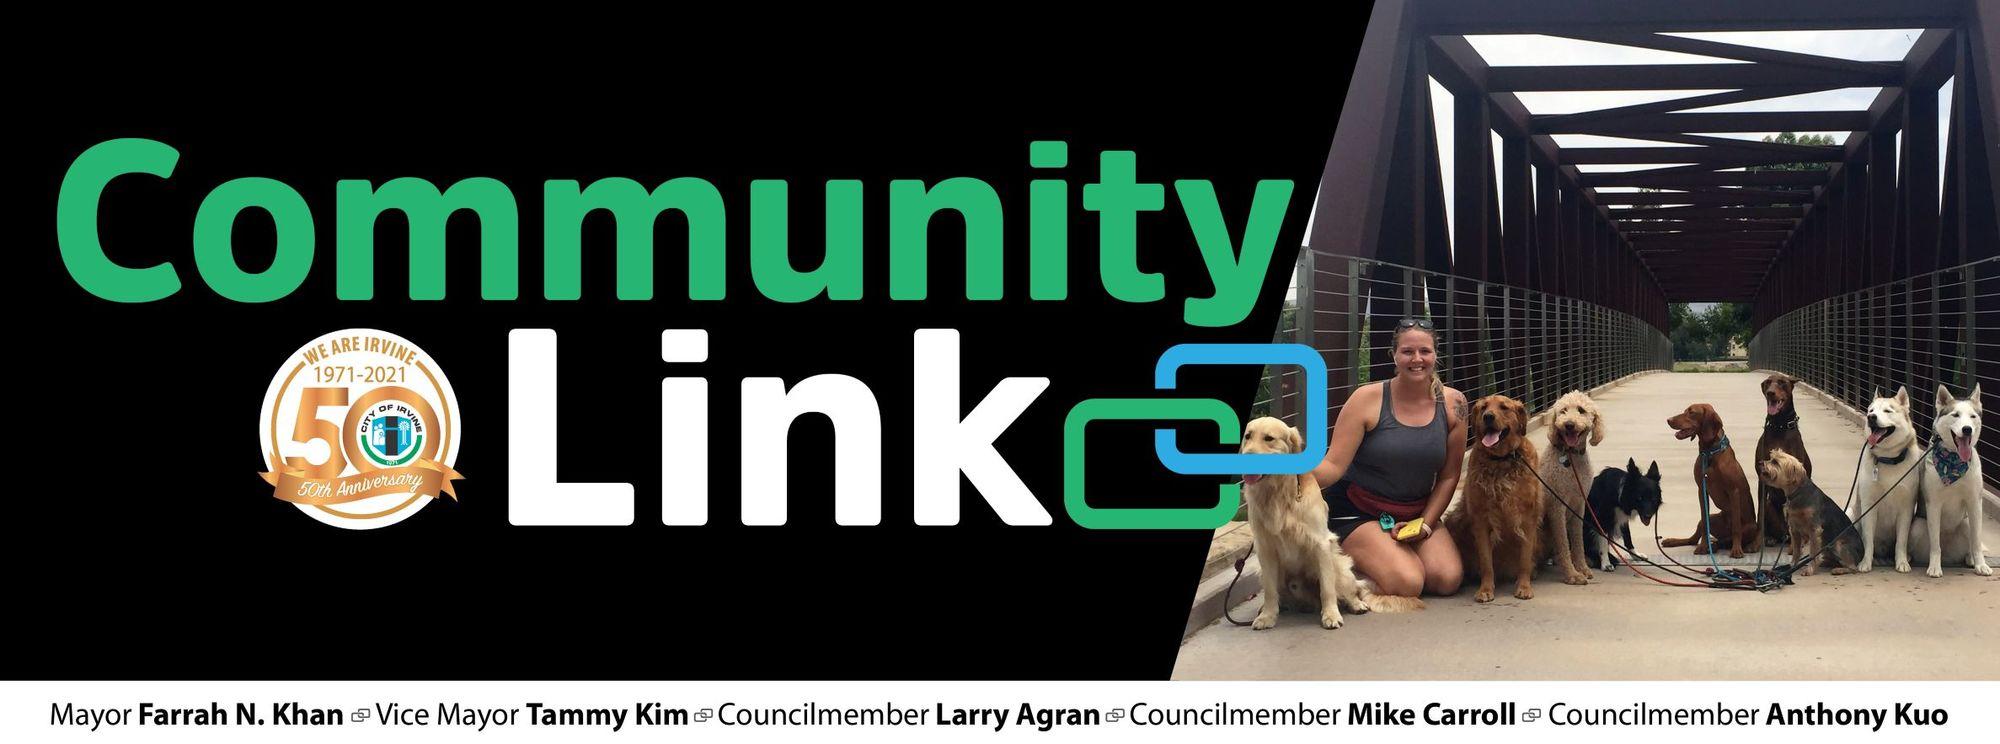 Community Link October 1